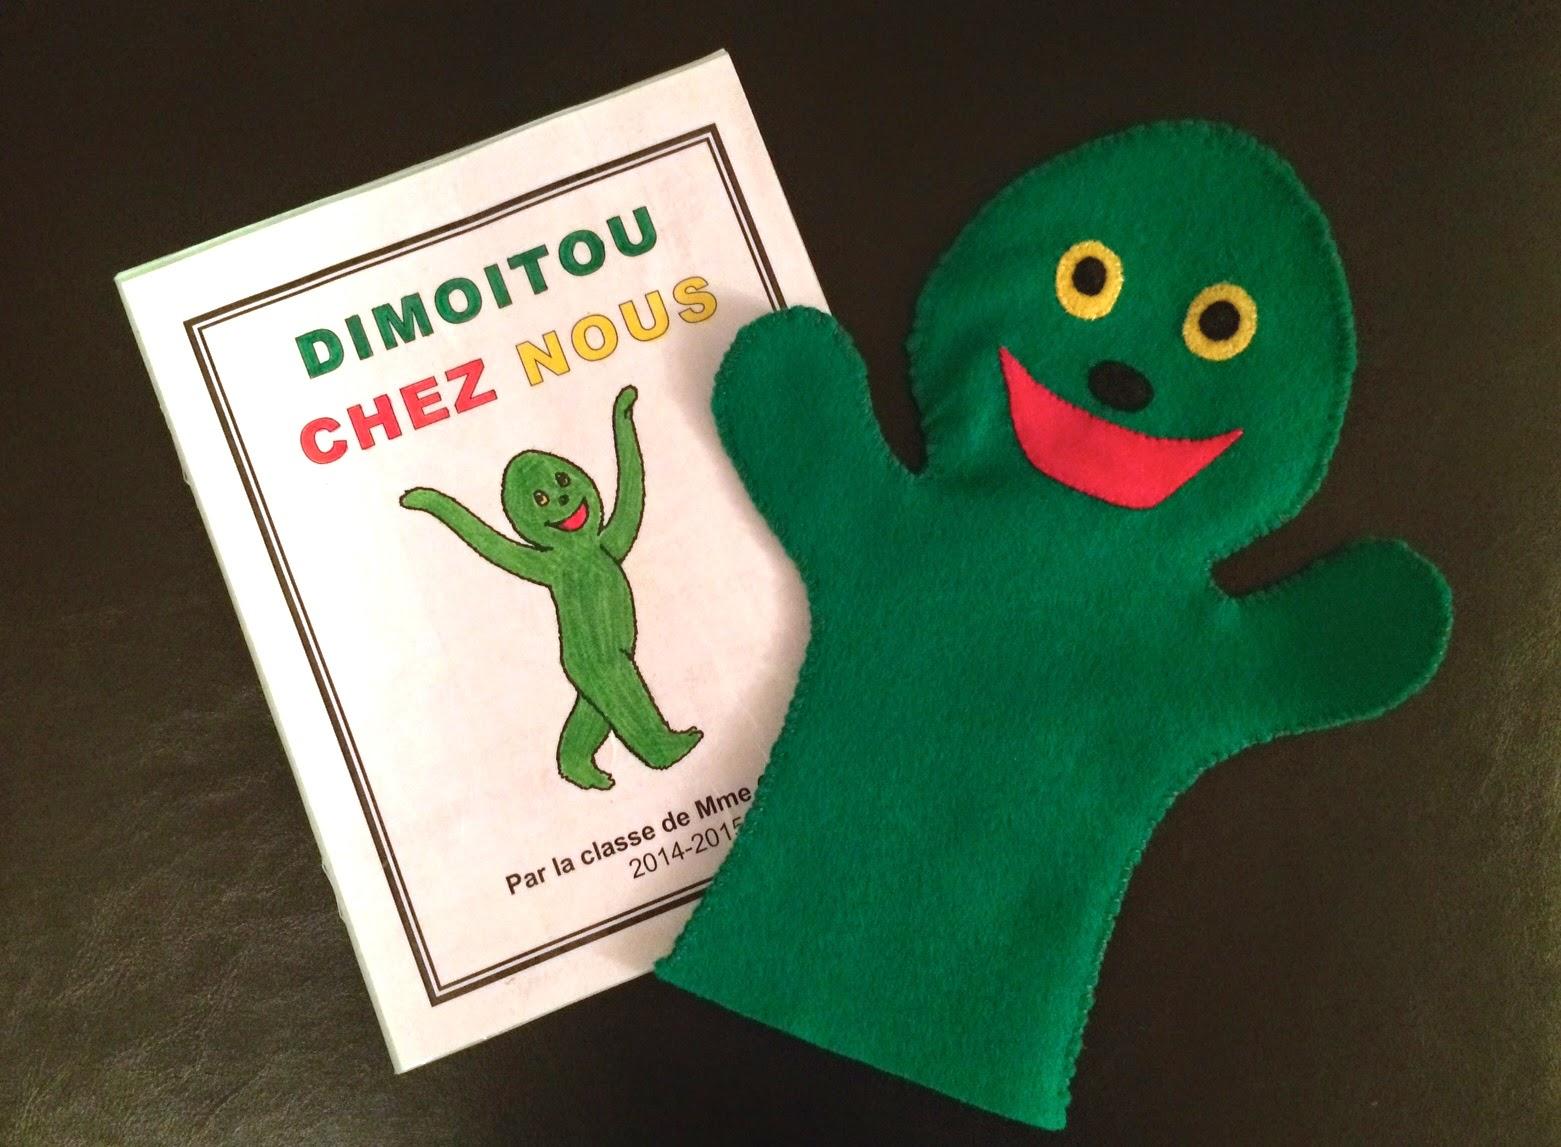 Dimoitou Hand Puppet - Dimoitou chez nous